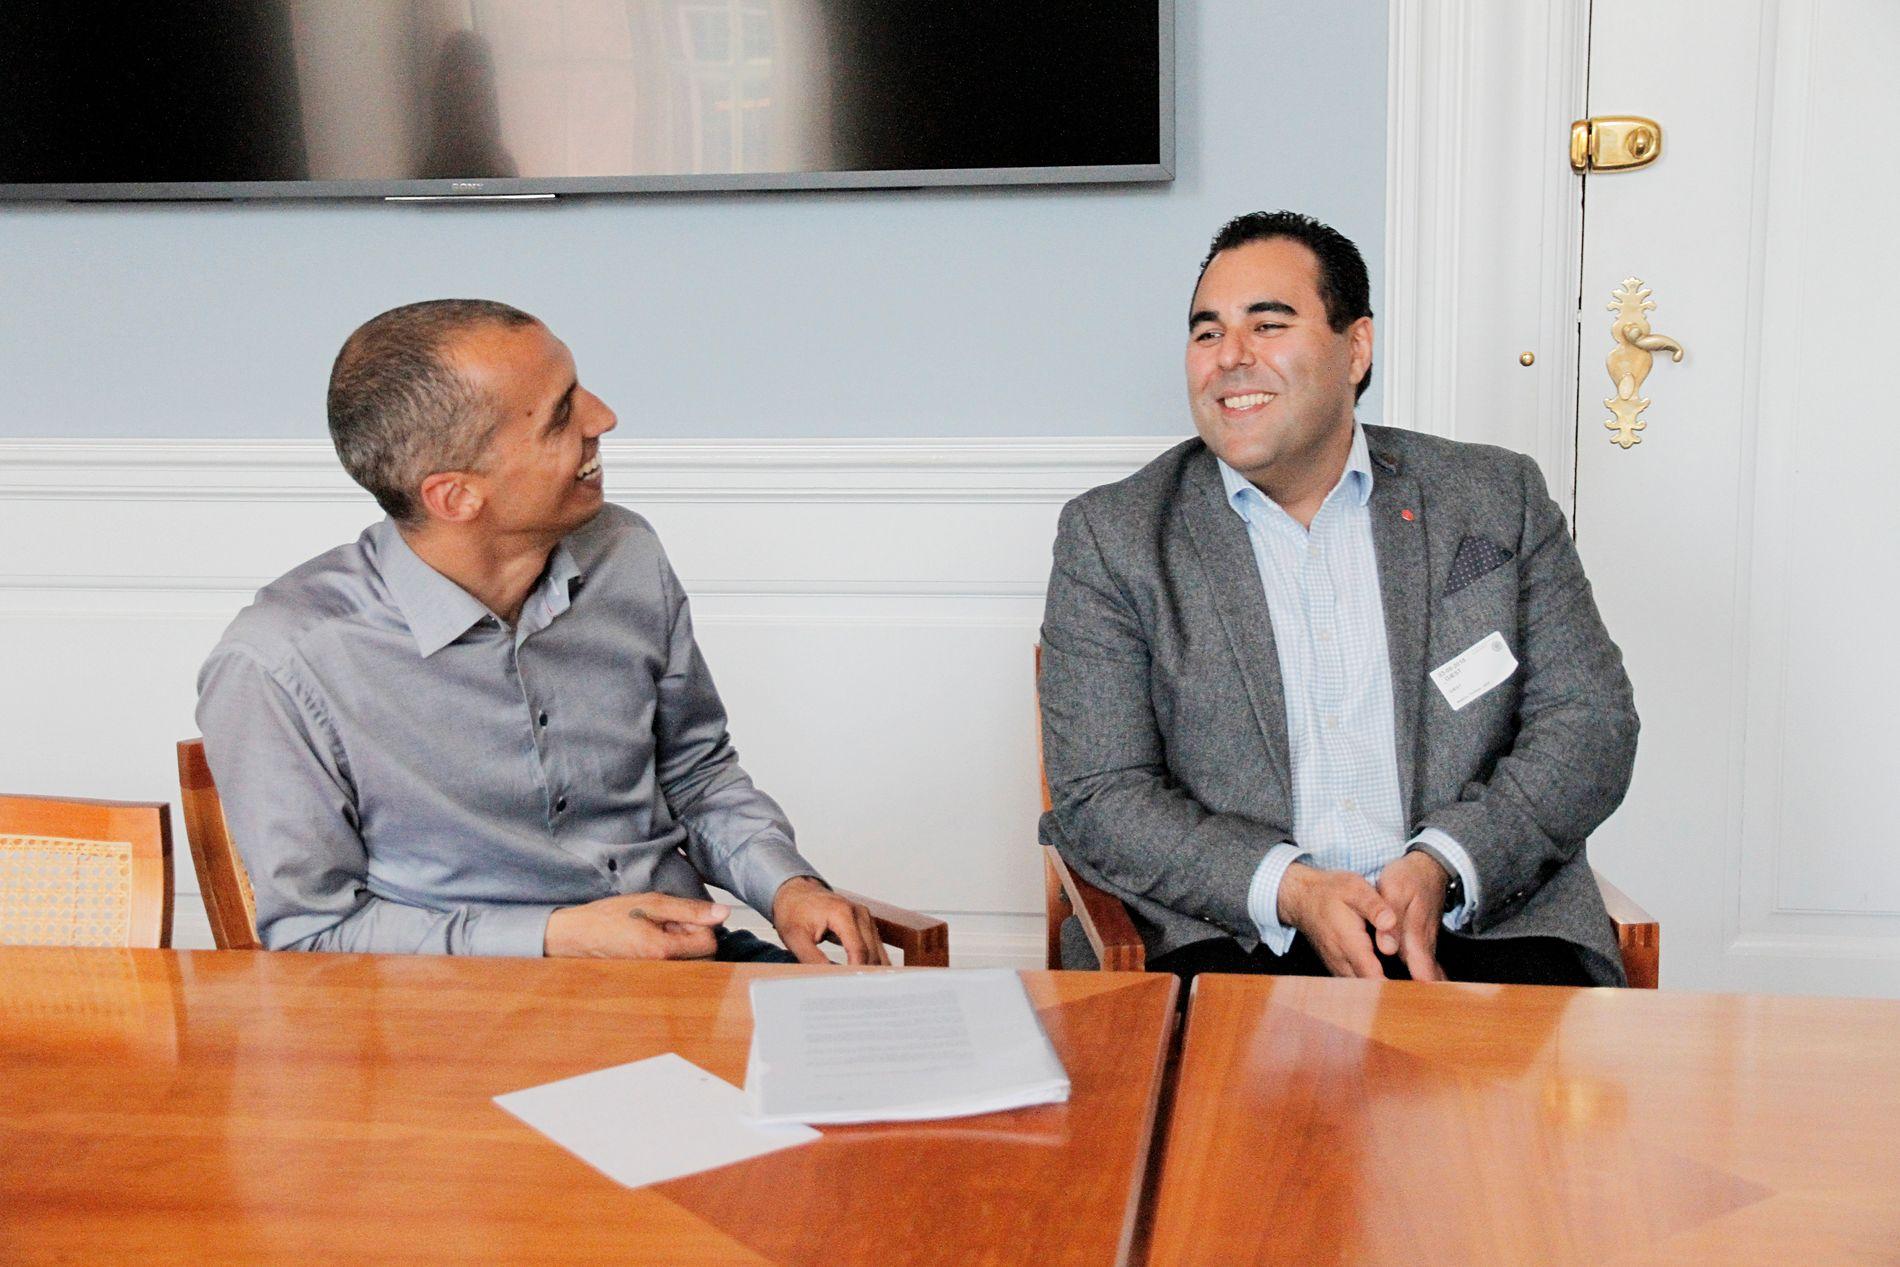 KOLLEGER: Innvandringspolitisk talsperson Masud Gharahkhani (Ap), og innvandringspolitisk talsperson Mattias Tesfaye (Sosialcemokratene).